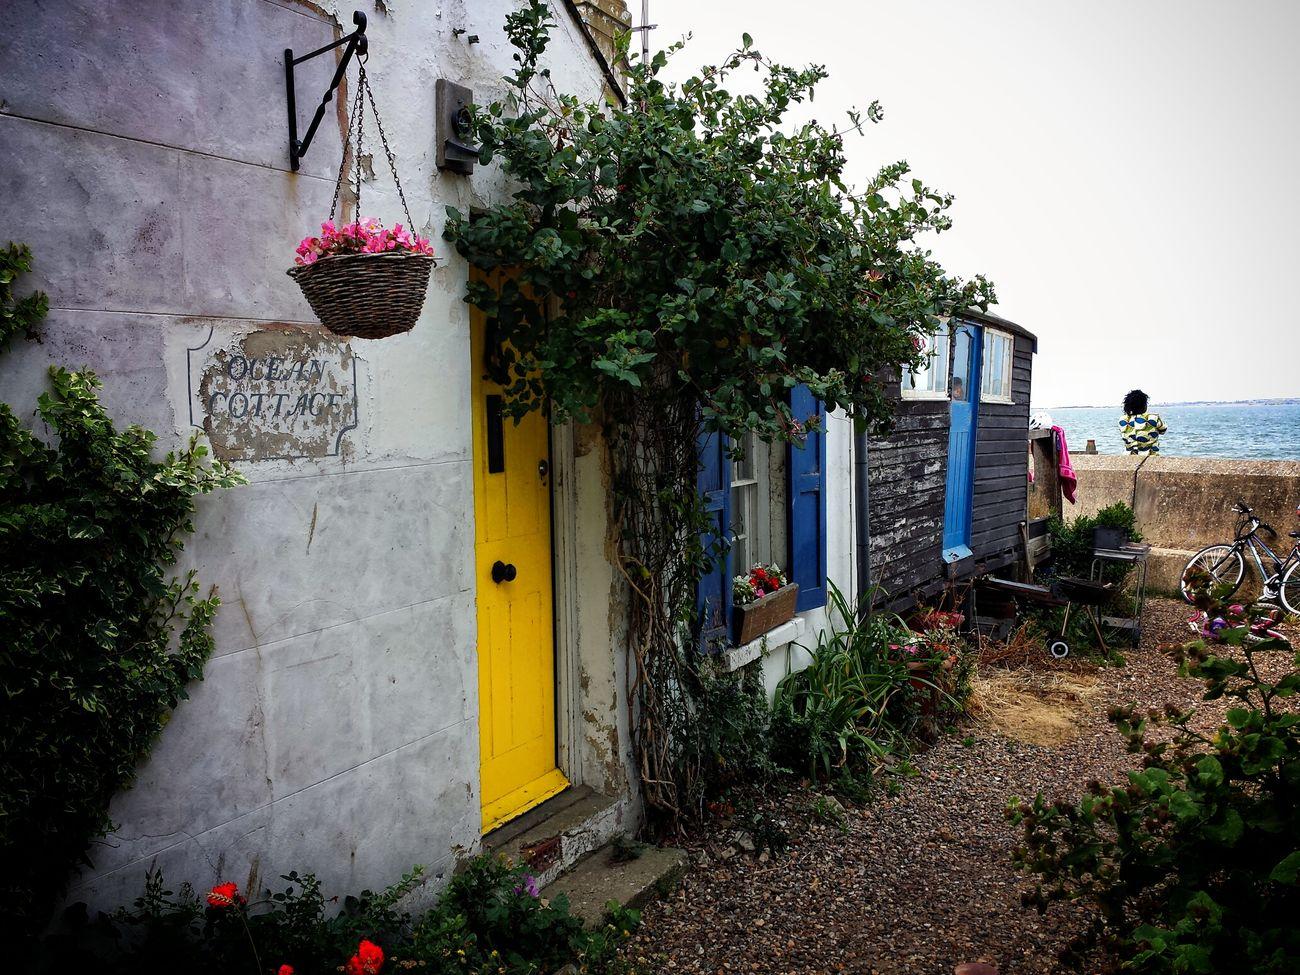 Ocean cottage Architecture Taking Photos